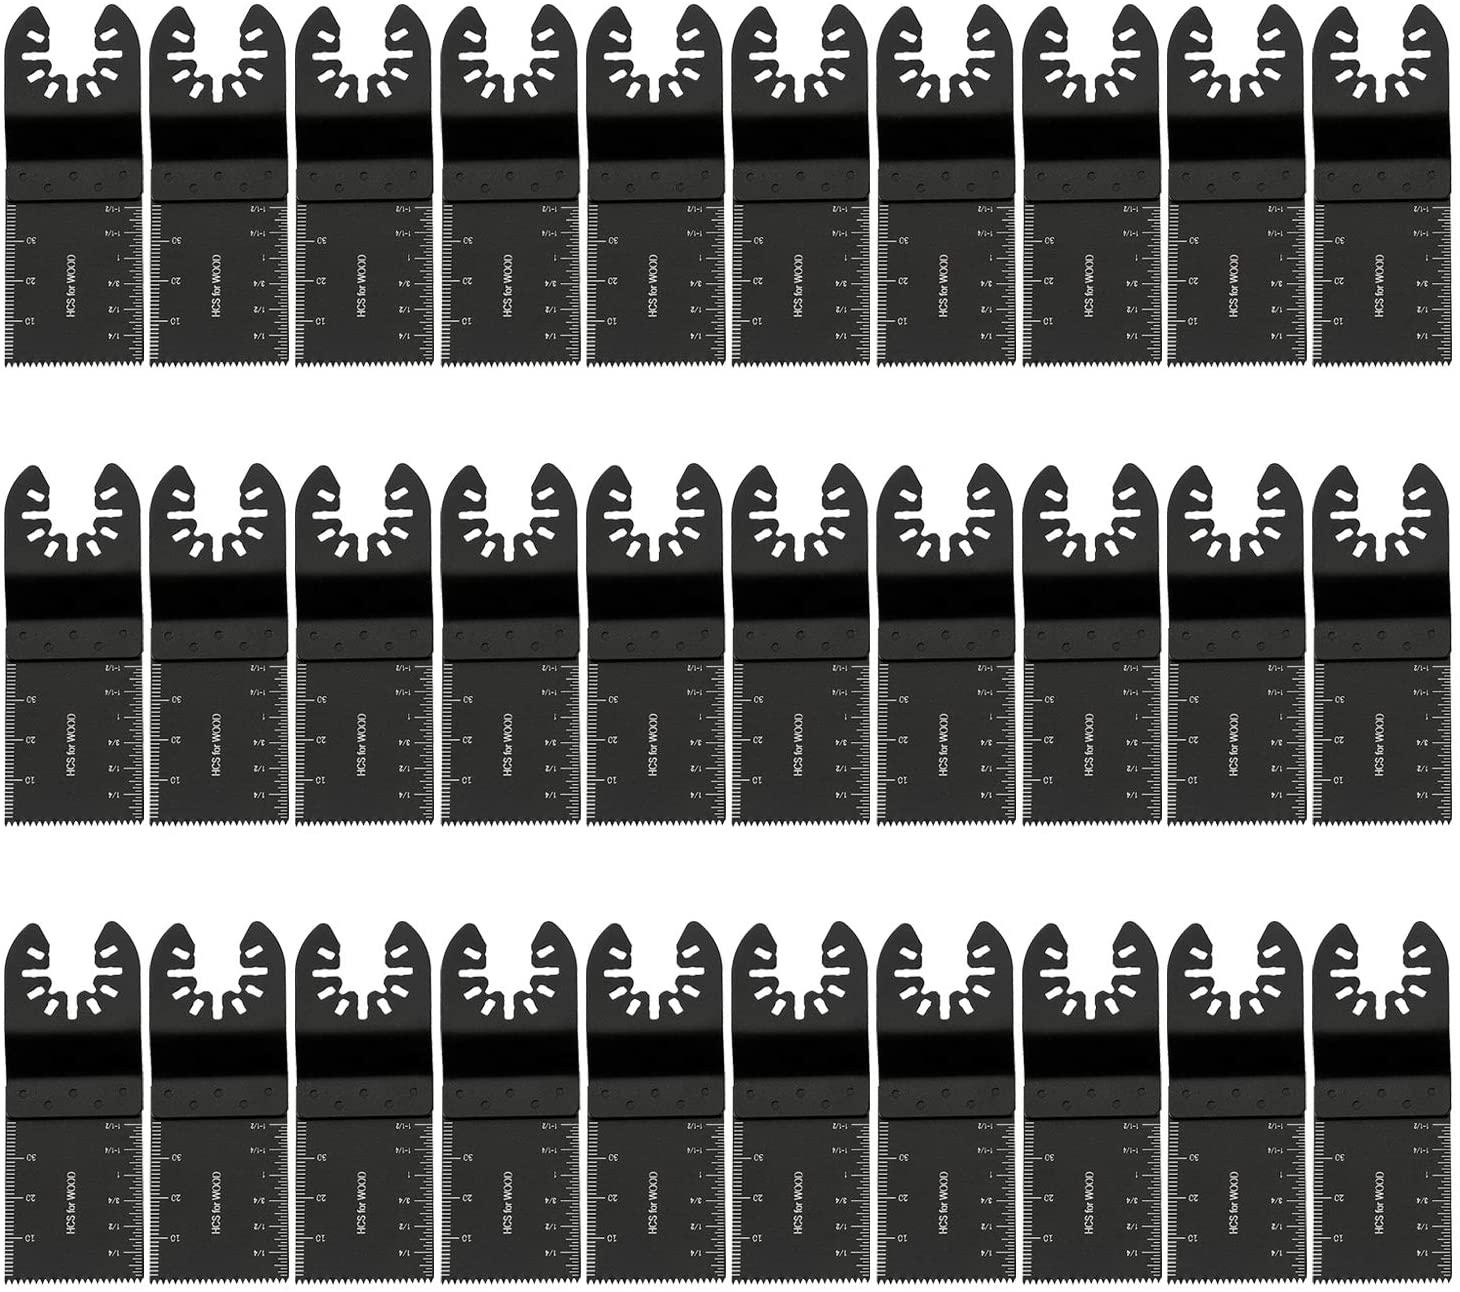 HOTBEST 60 Pcs Wood Oscillating Saw Blades Pro for Porter Cable Rockwell Makita Black&Decker Dremel Multimaster Ridgid Craftsman Chicago etc